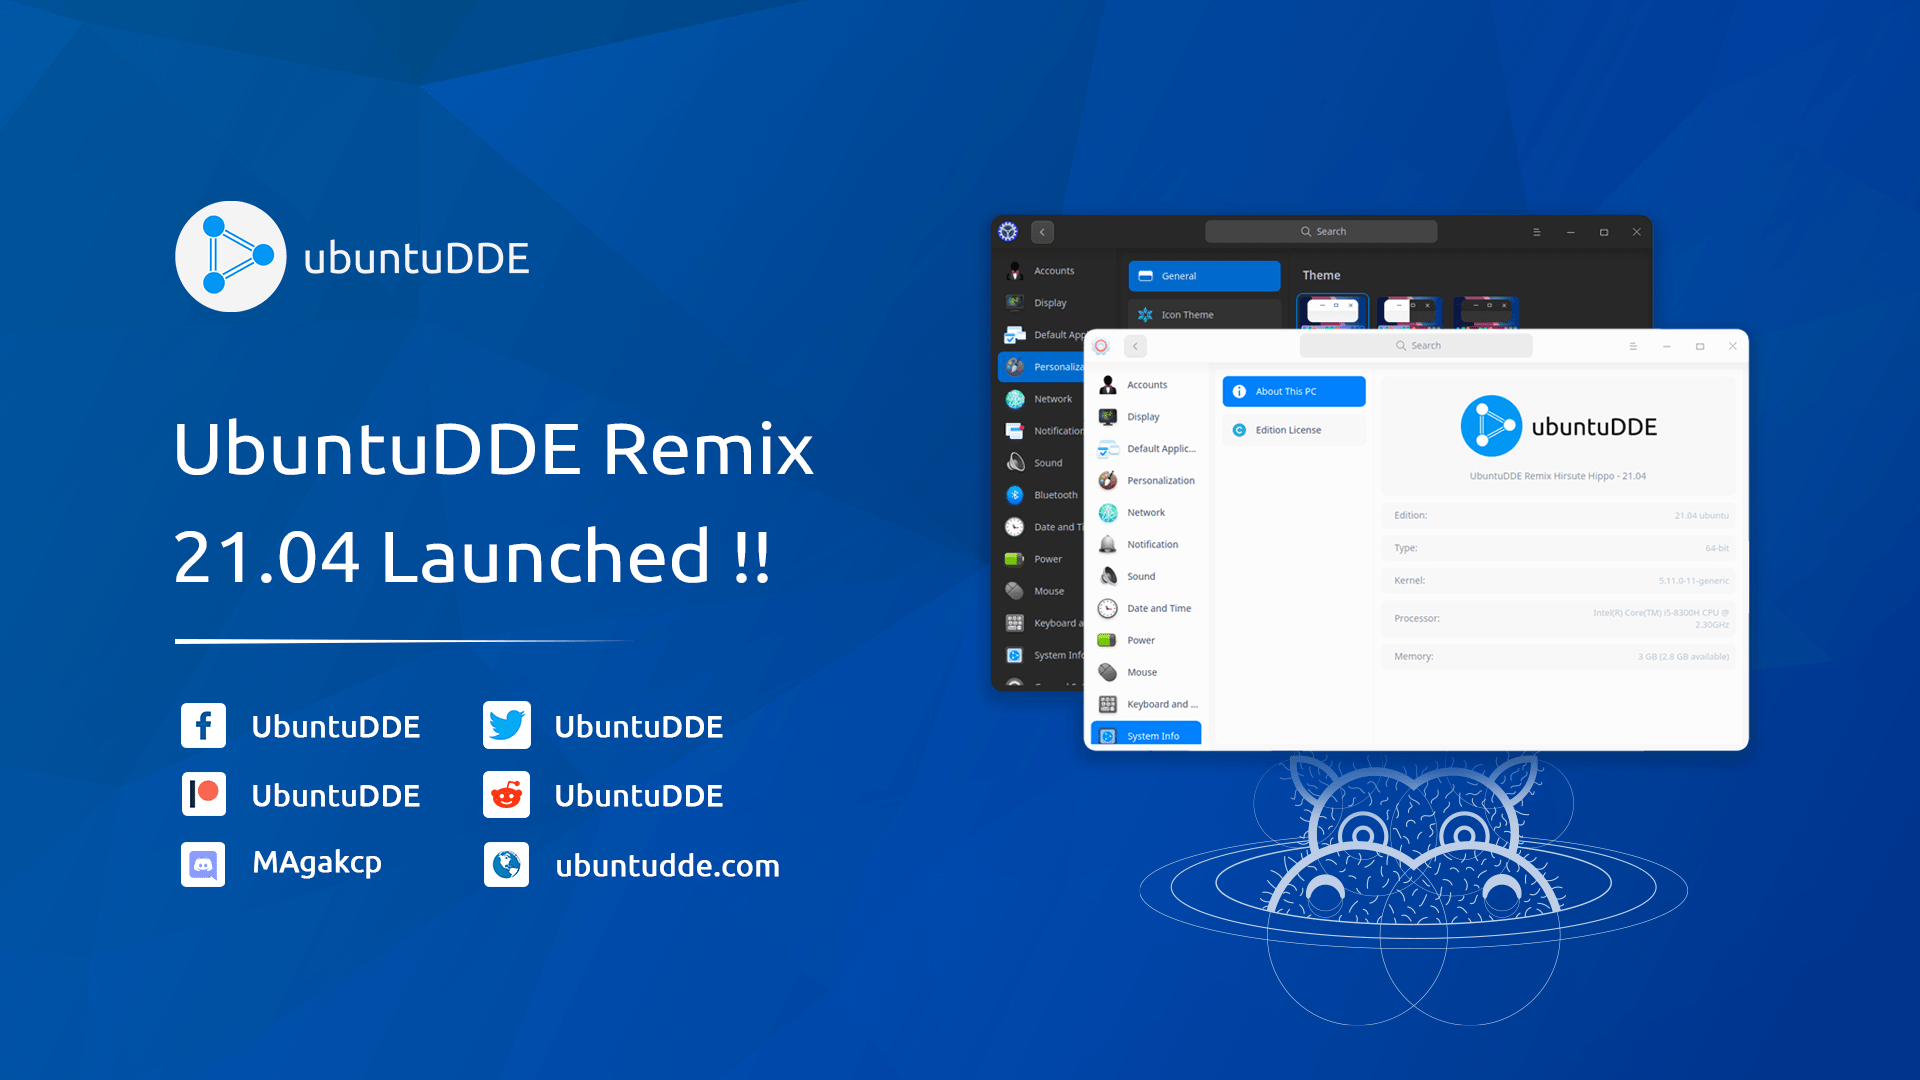 UbuntuDDE Remix 21.04 Release